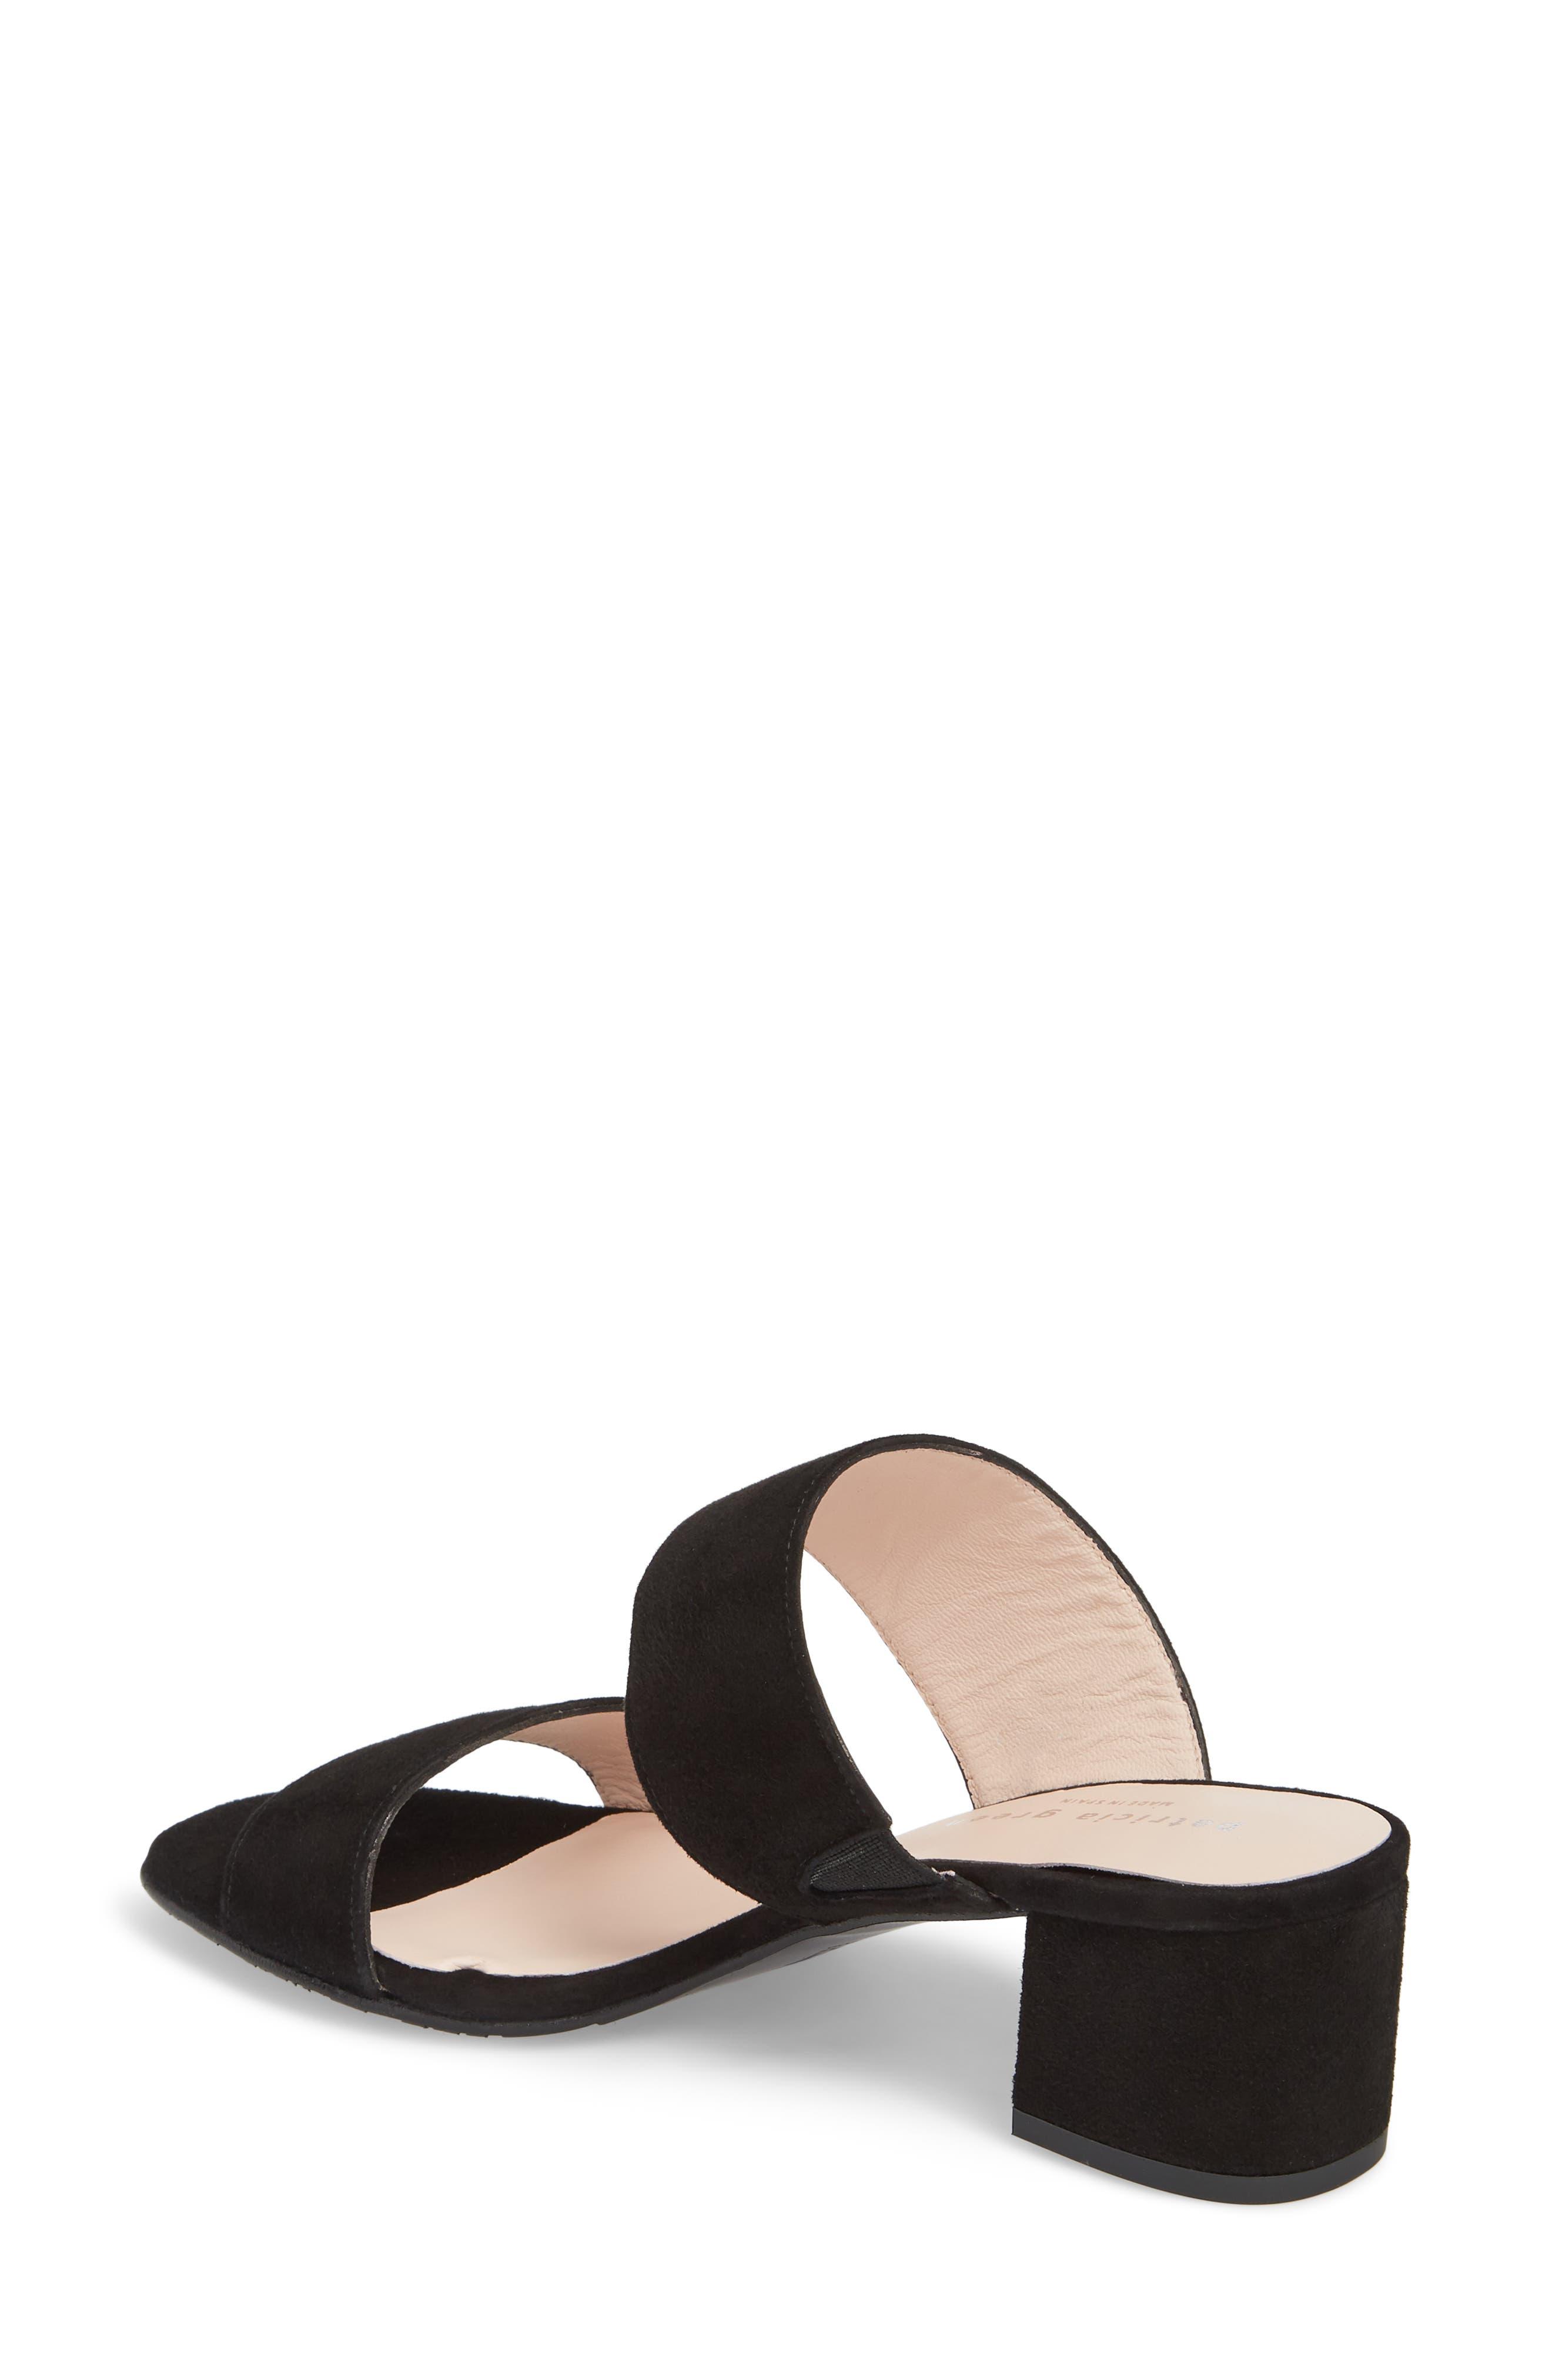 Lola Slide Sandal,                             Alternate thumbnail 2, color,                             Black Suede